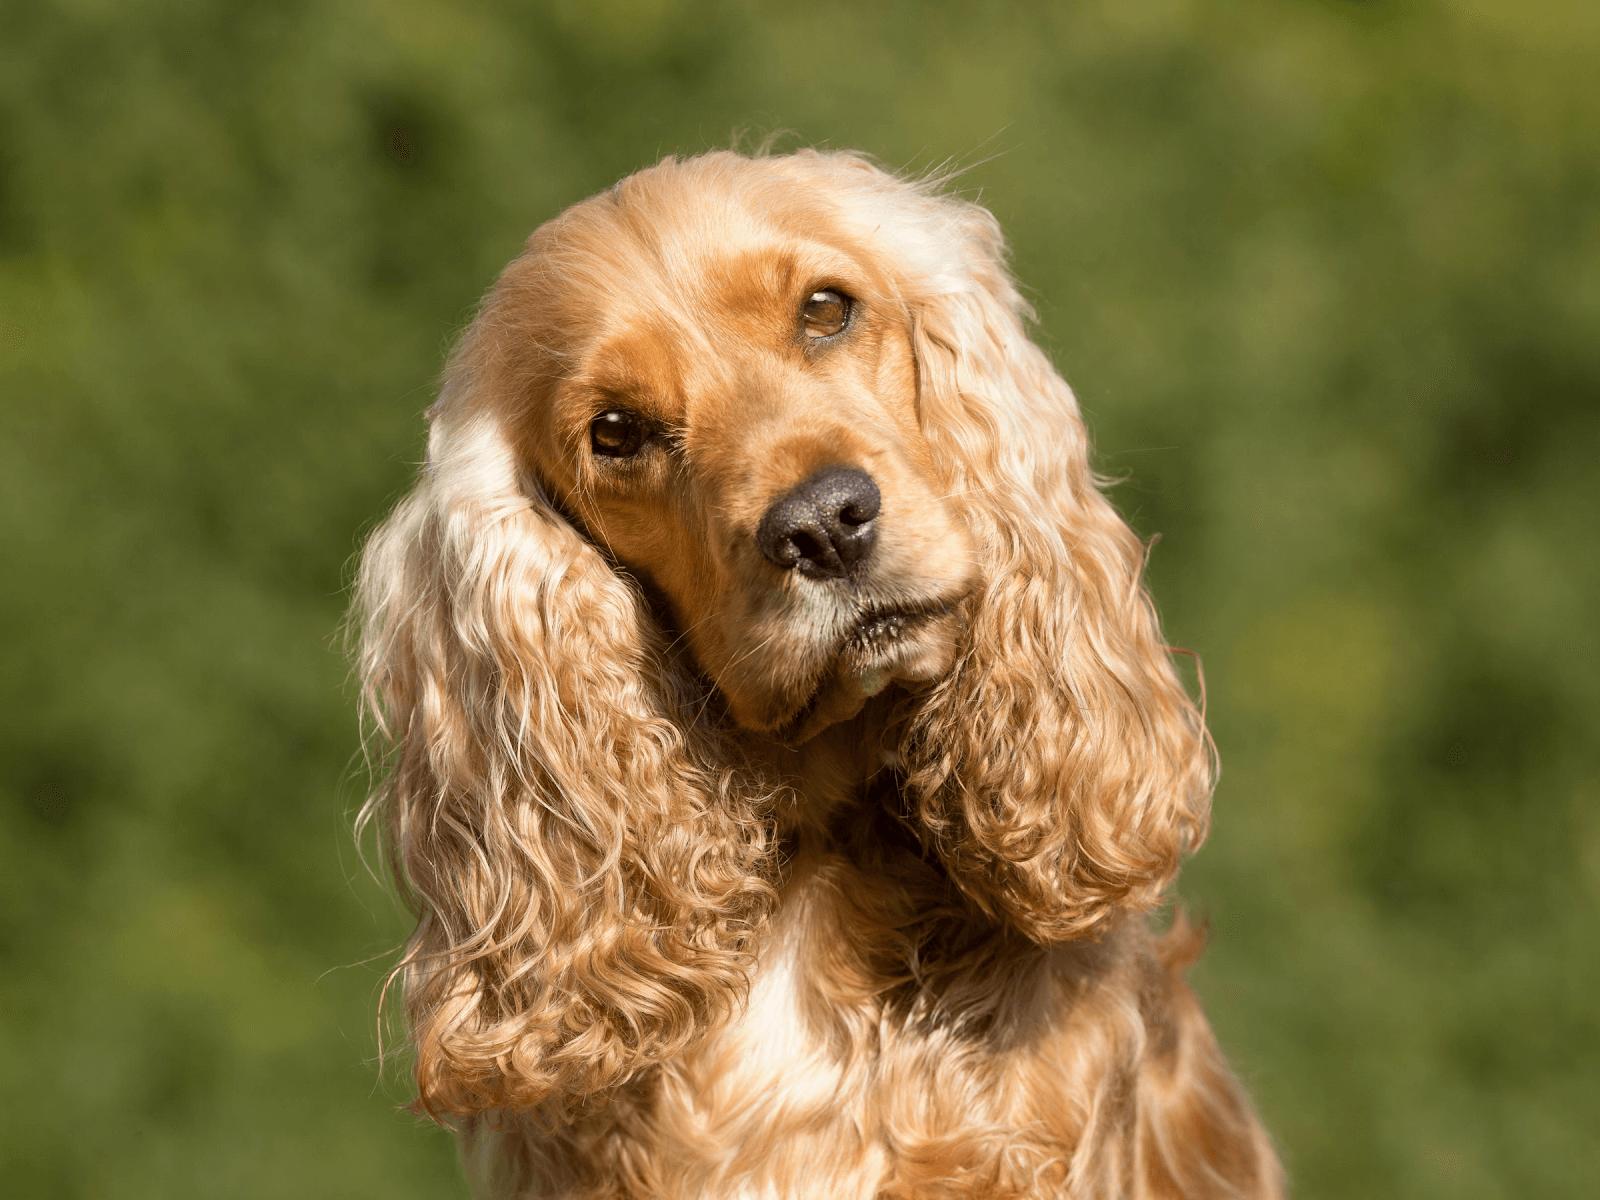 cocker-spaniel-dog-family